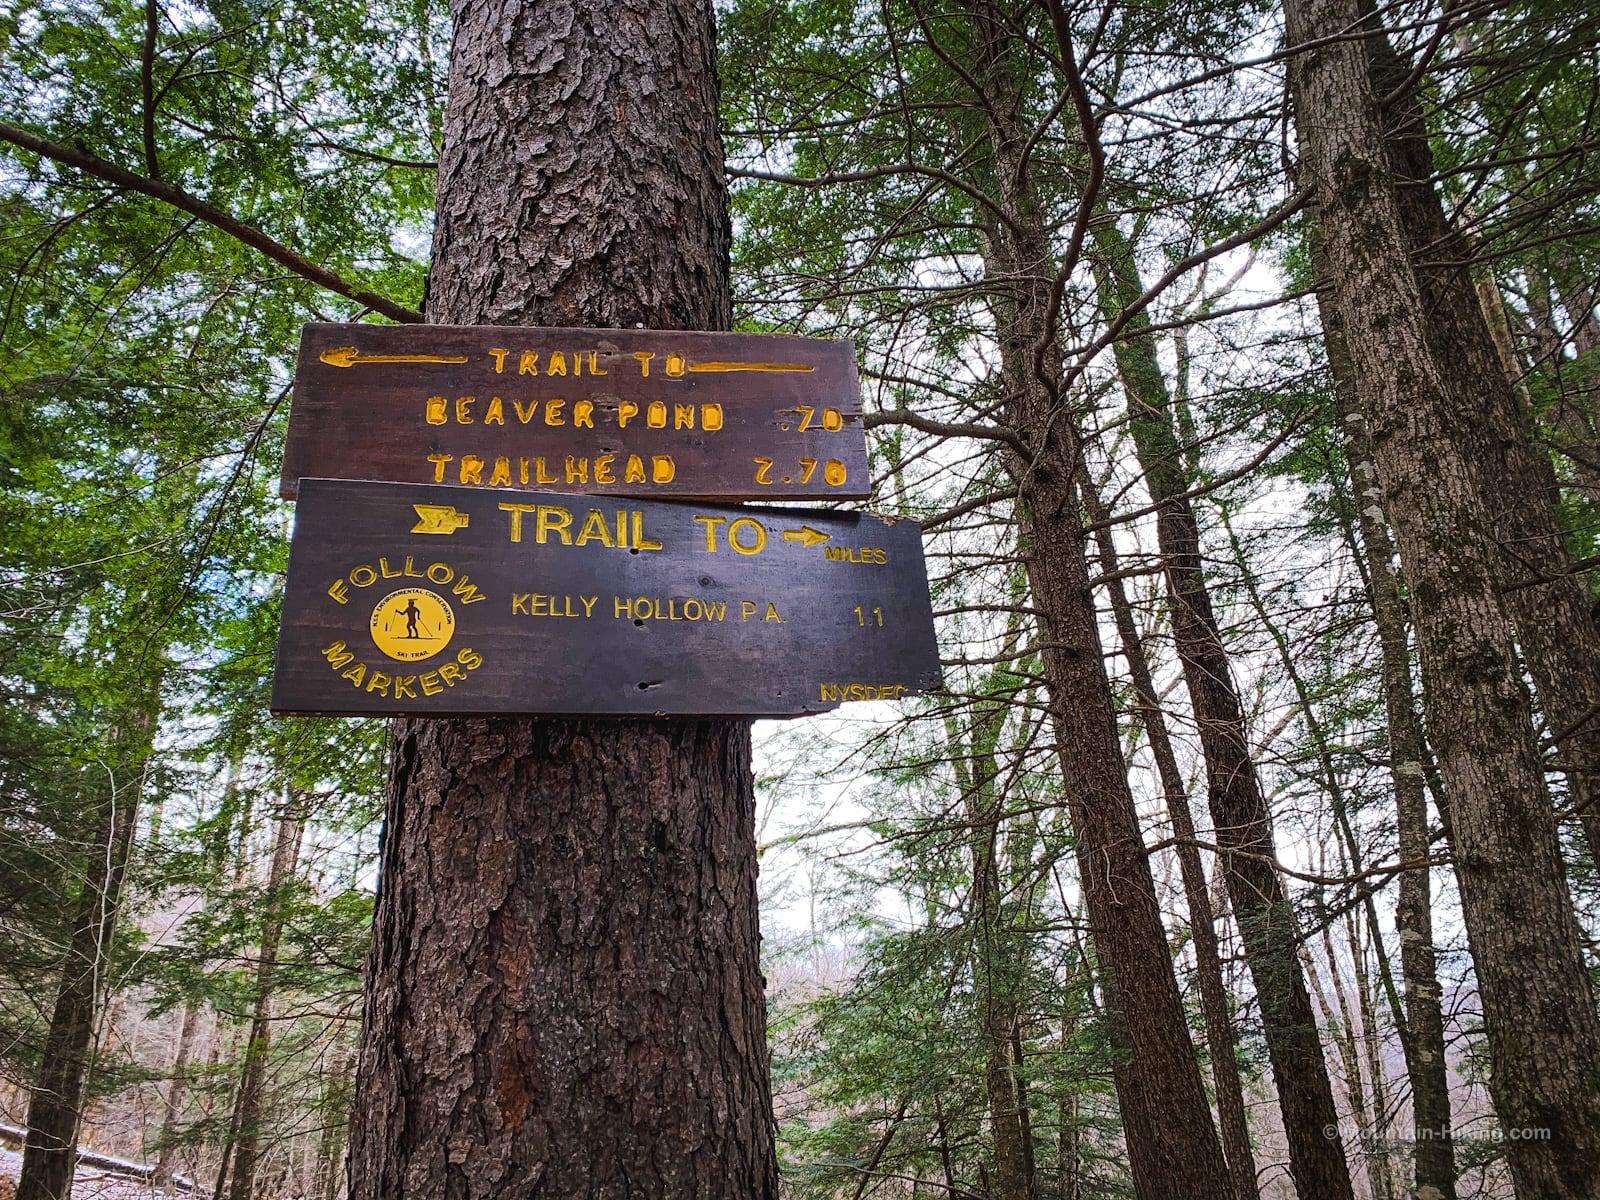 signposts on tree